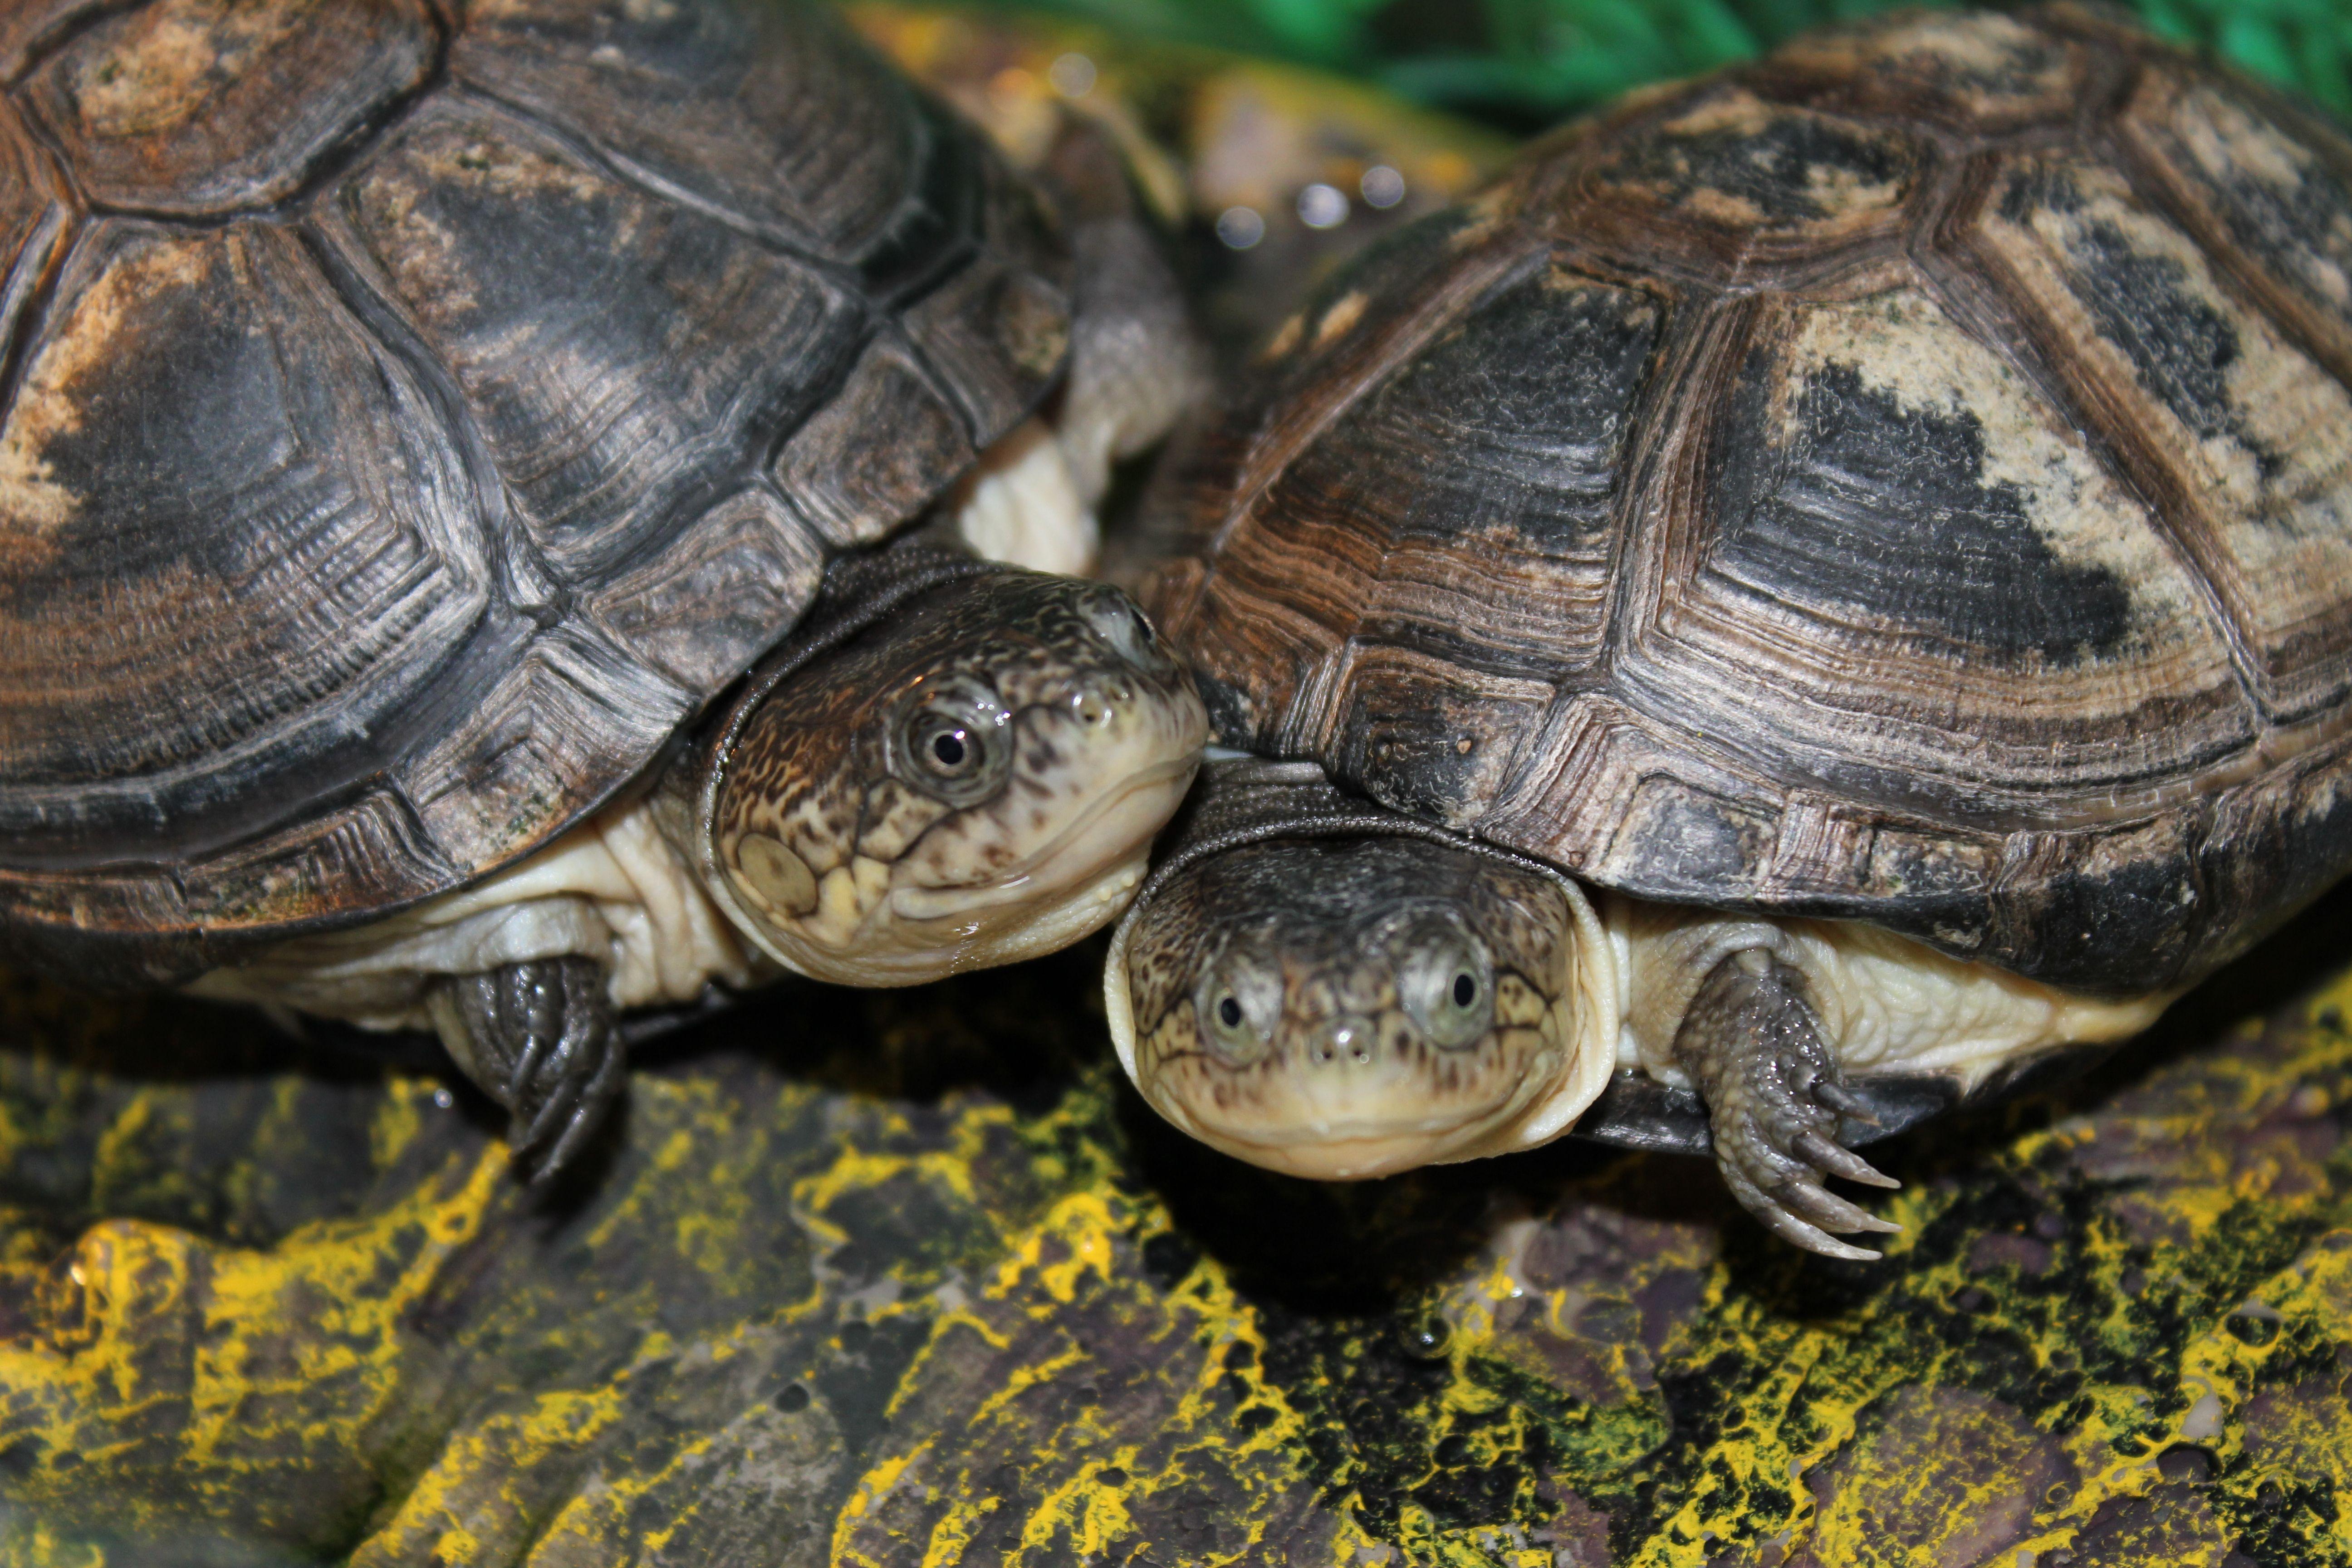 African Sideneck Aquatic Turtles look at those smiles